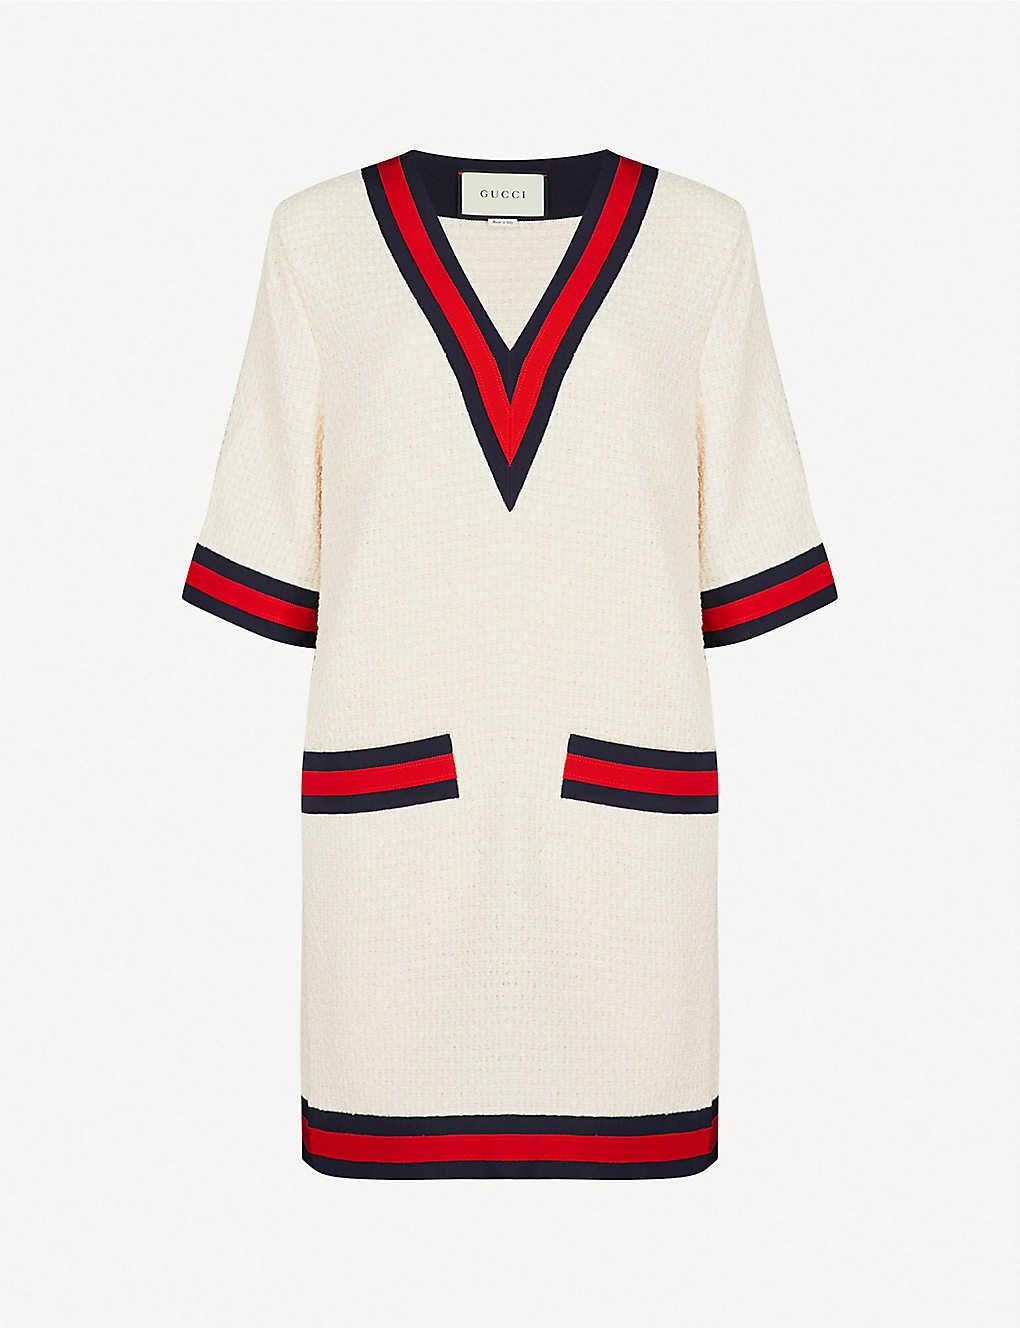 6674cce88a GUCCI - Ribbon-trim tweed T-shirt dress | Selfridges.com